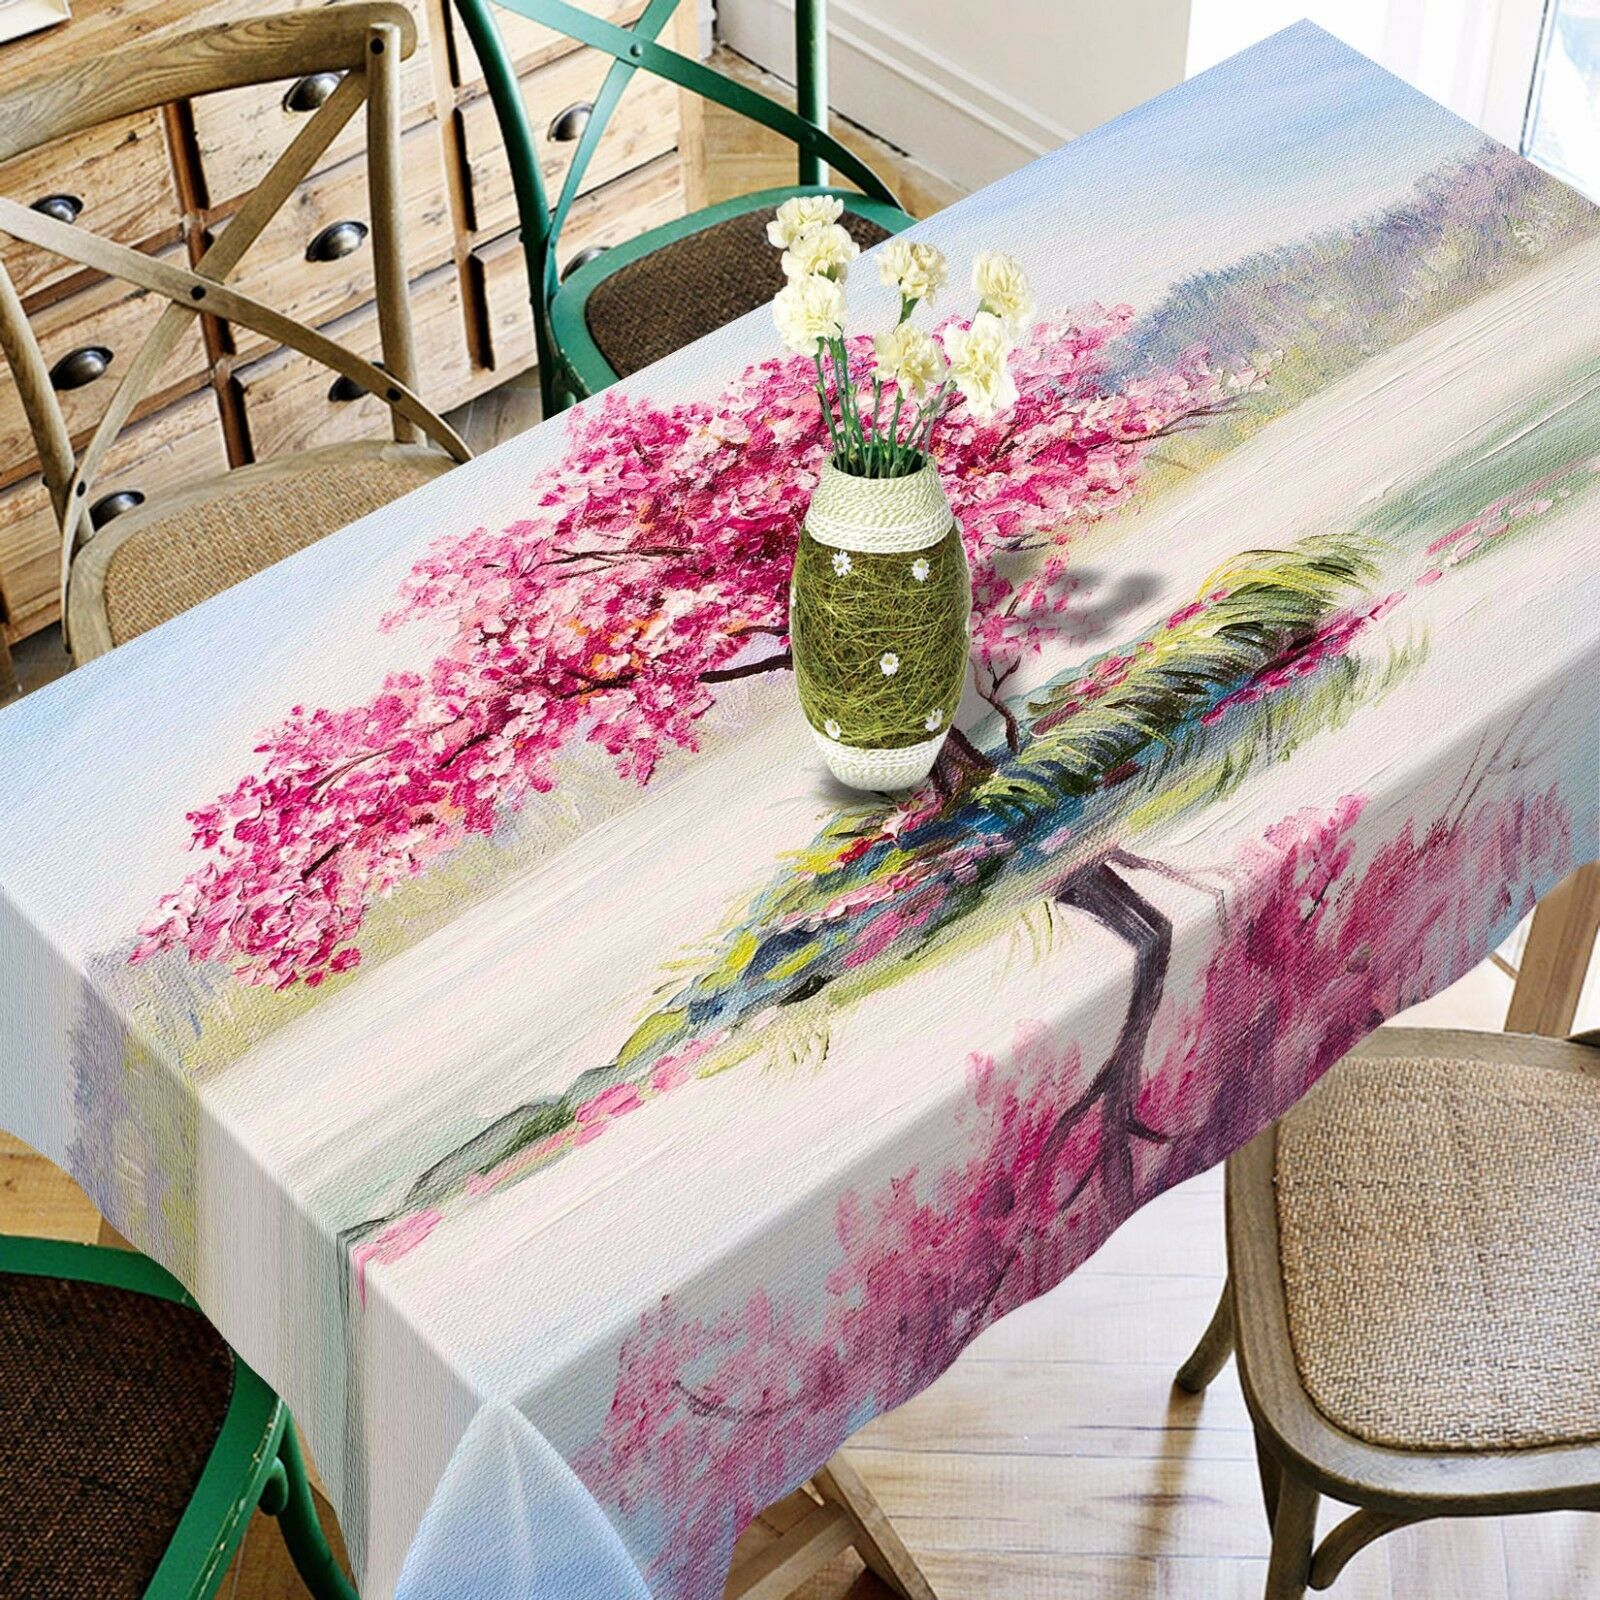 3D Squid Squid Squid Lake Tablecloth Table Cover Cloth Birthday Party AJ WALLPAPER UK Lemon 203286